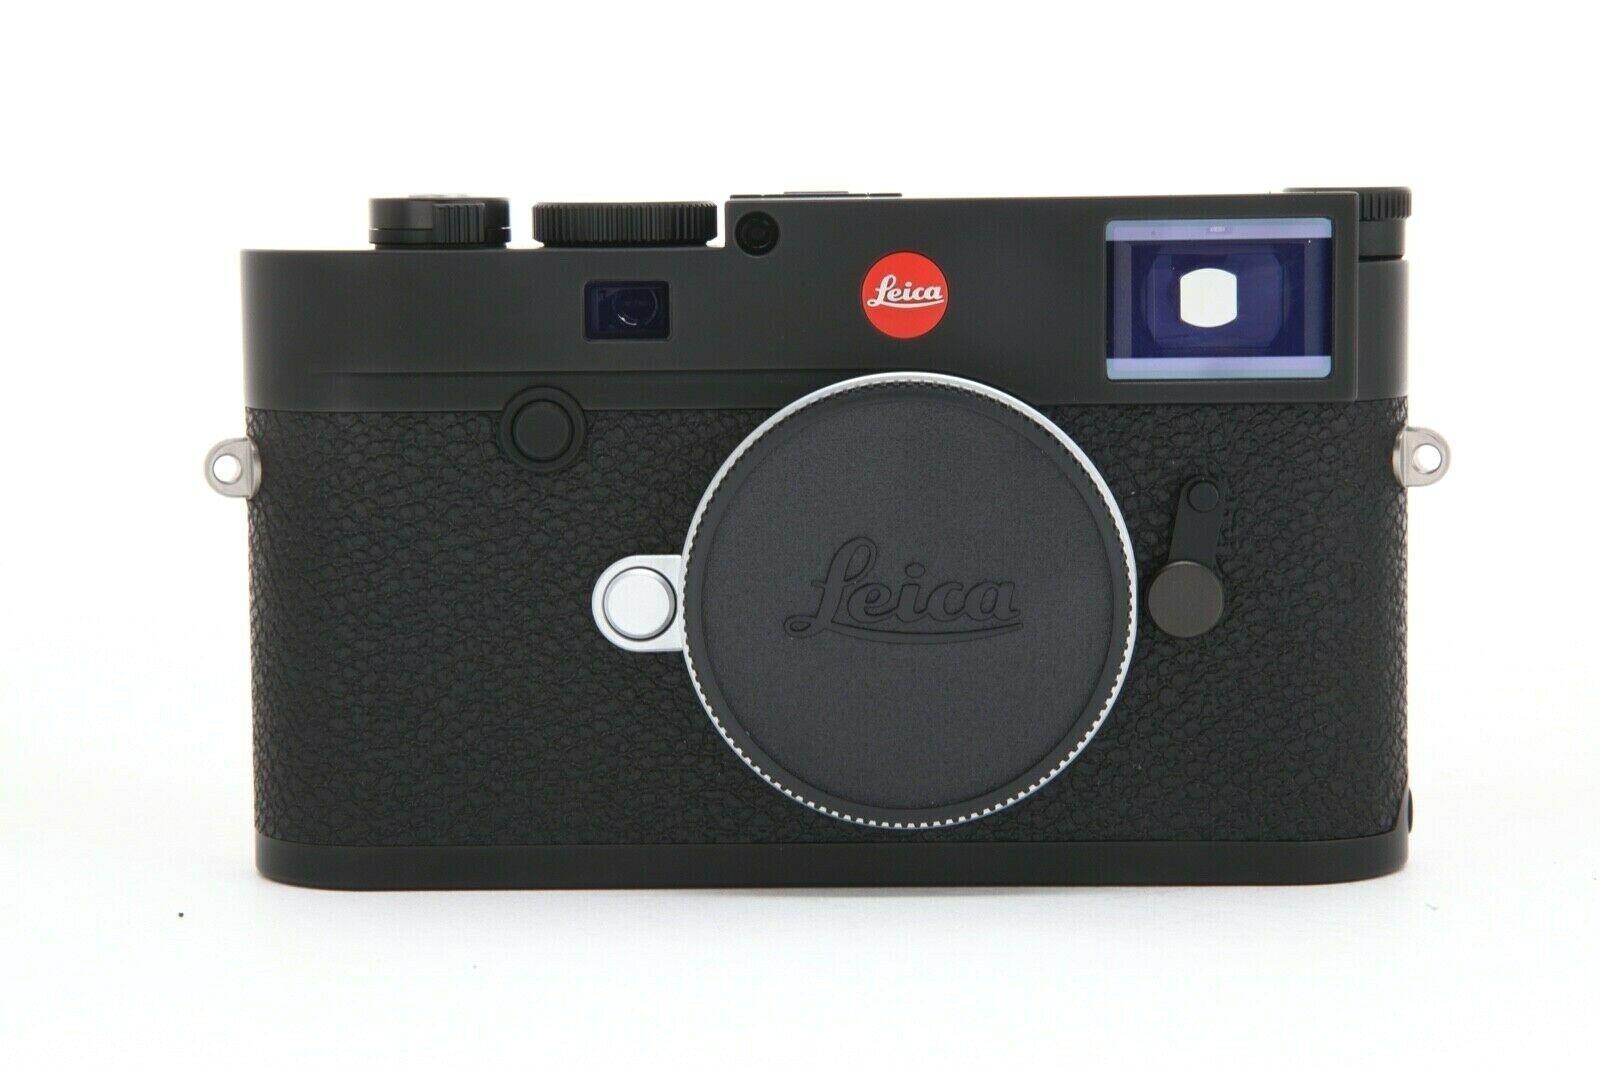 Leica M10-R Digital Rangefinder Camera (Black, 20002)